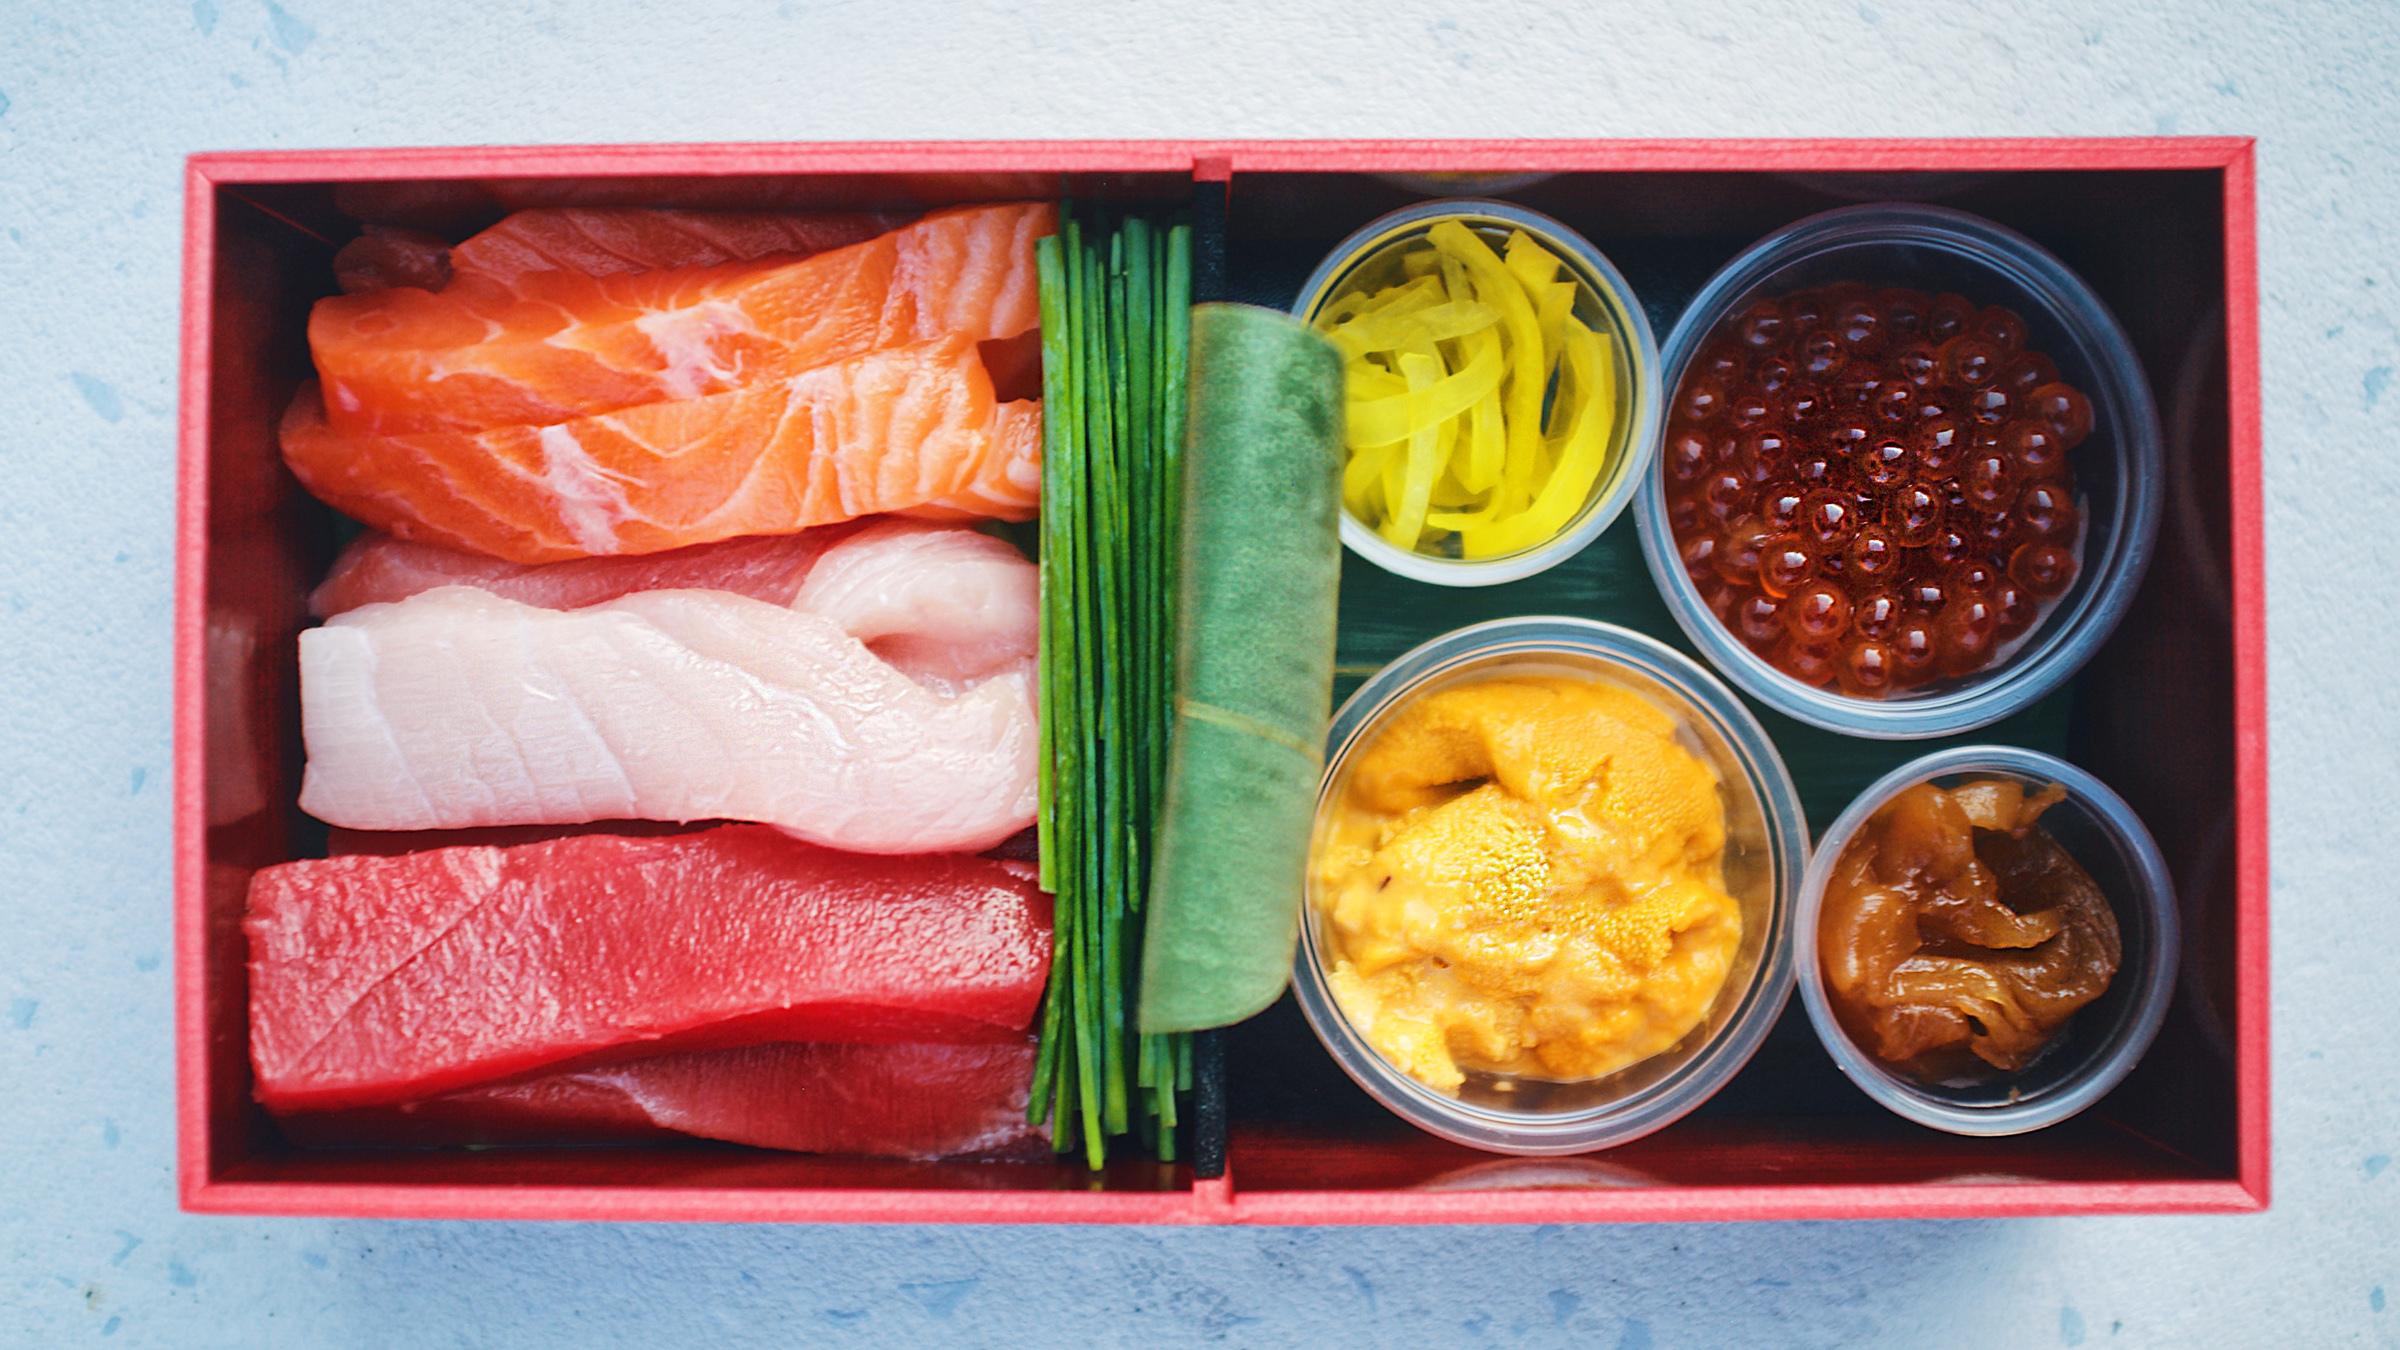 Sushi Tama takeout